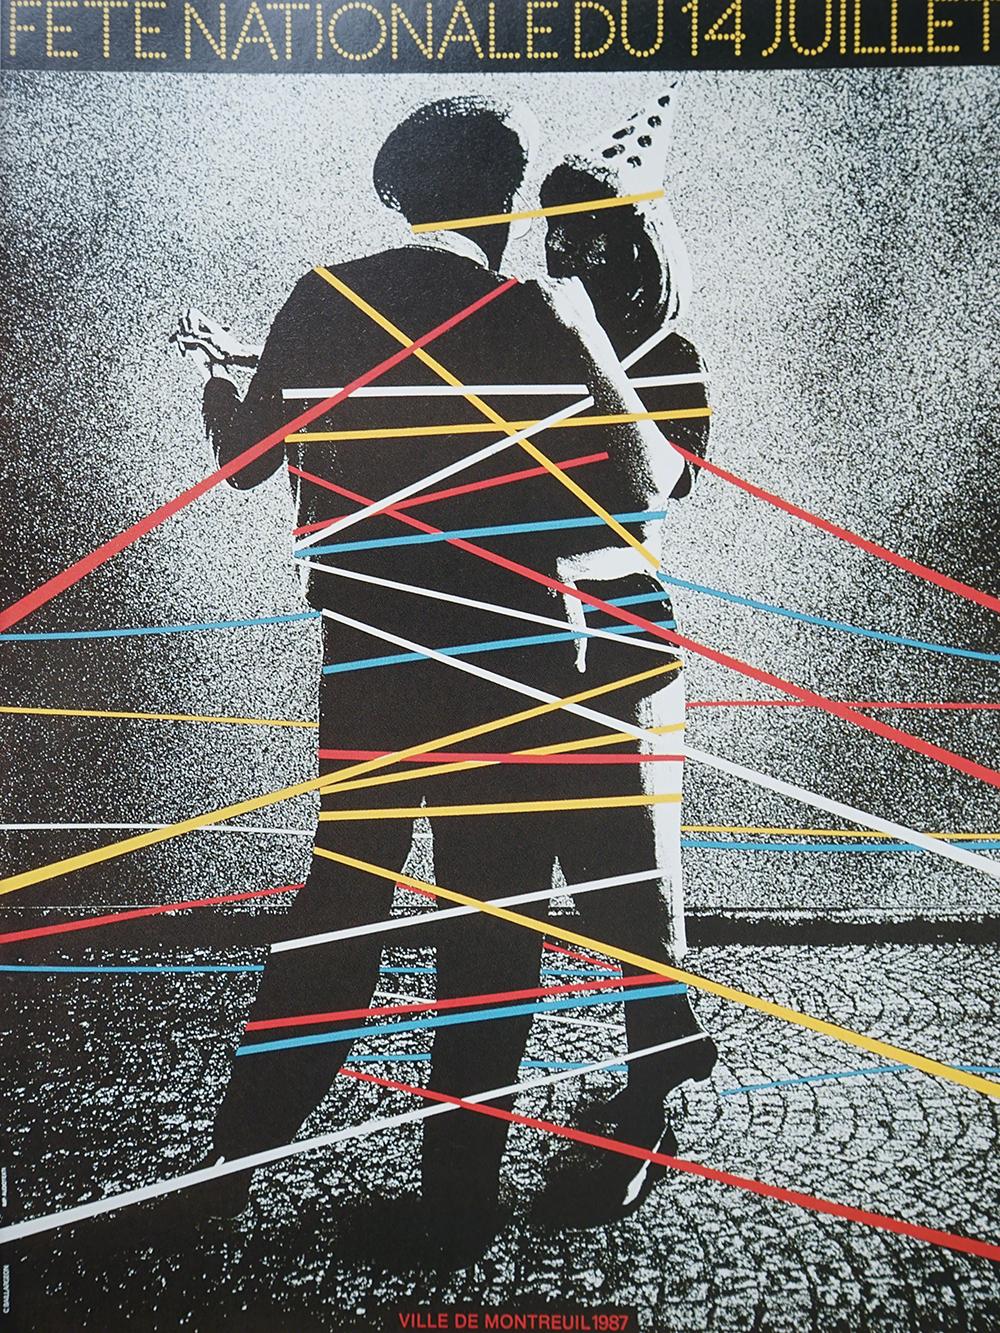 14juillet-c-baillargeon-web-1987.jpg